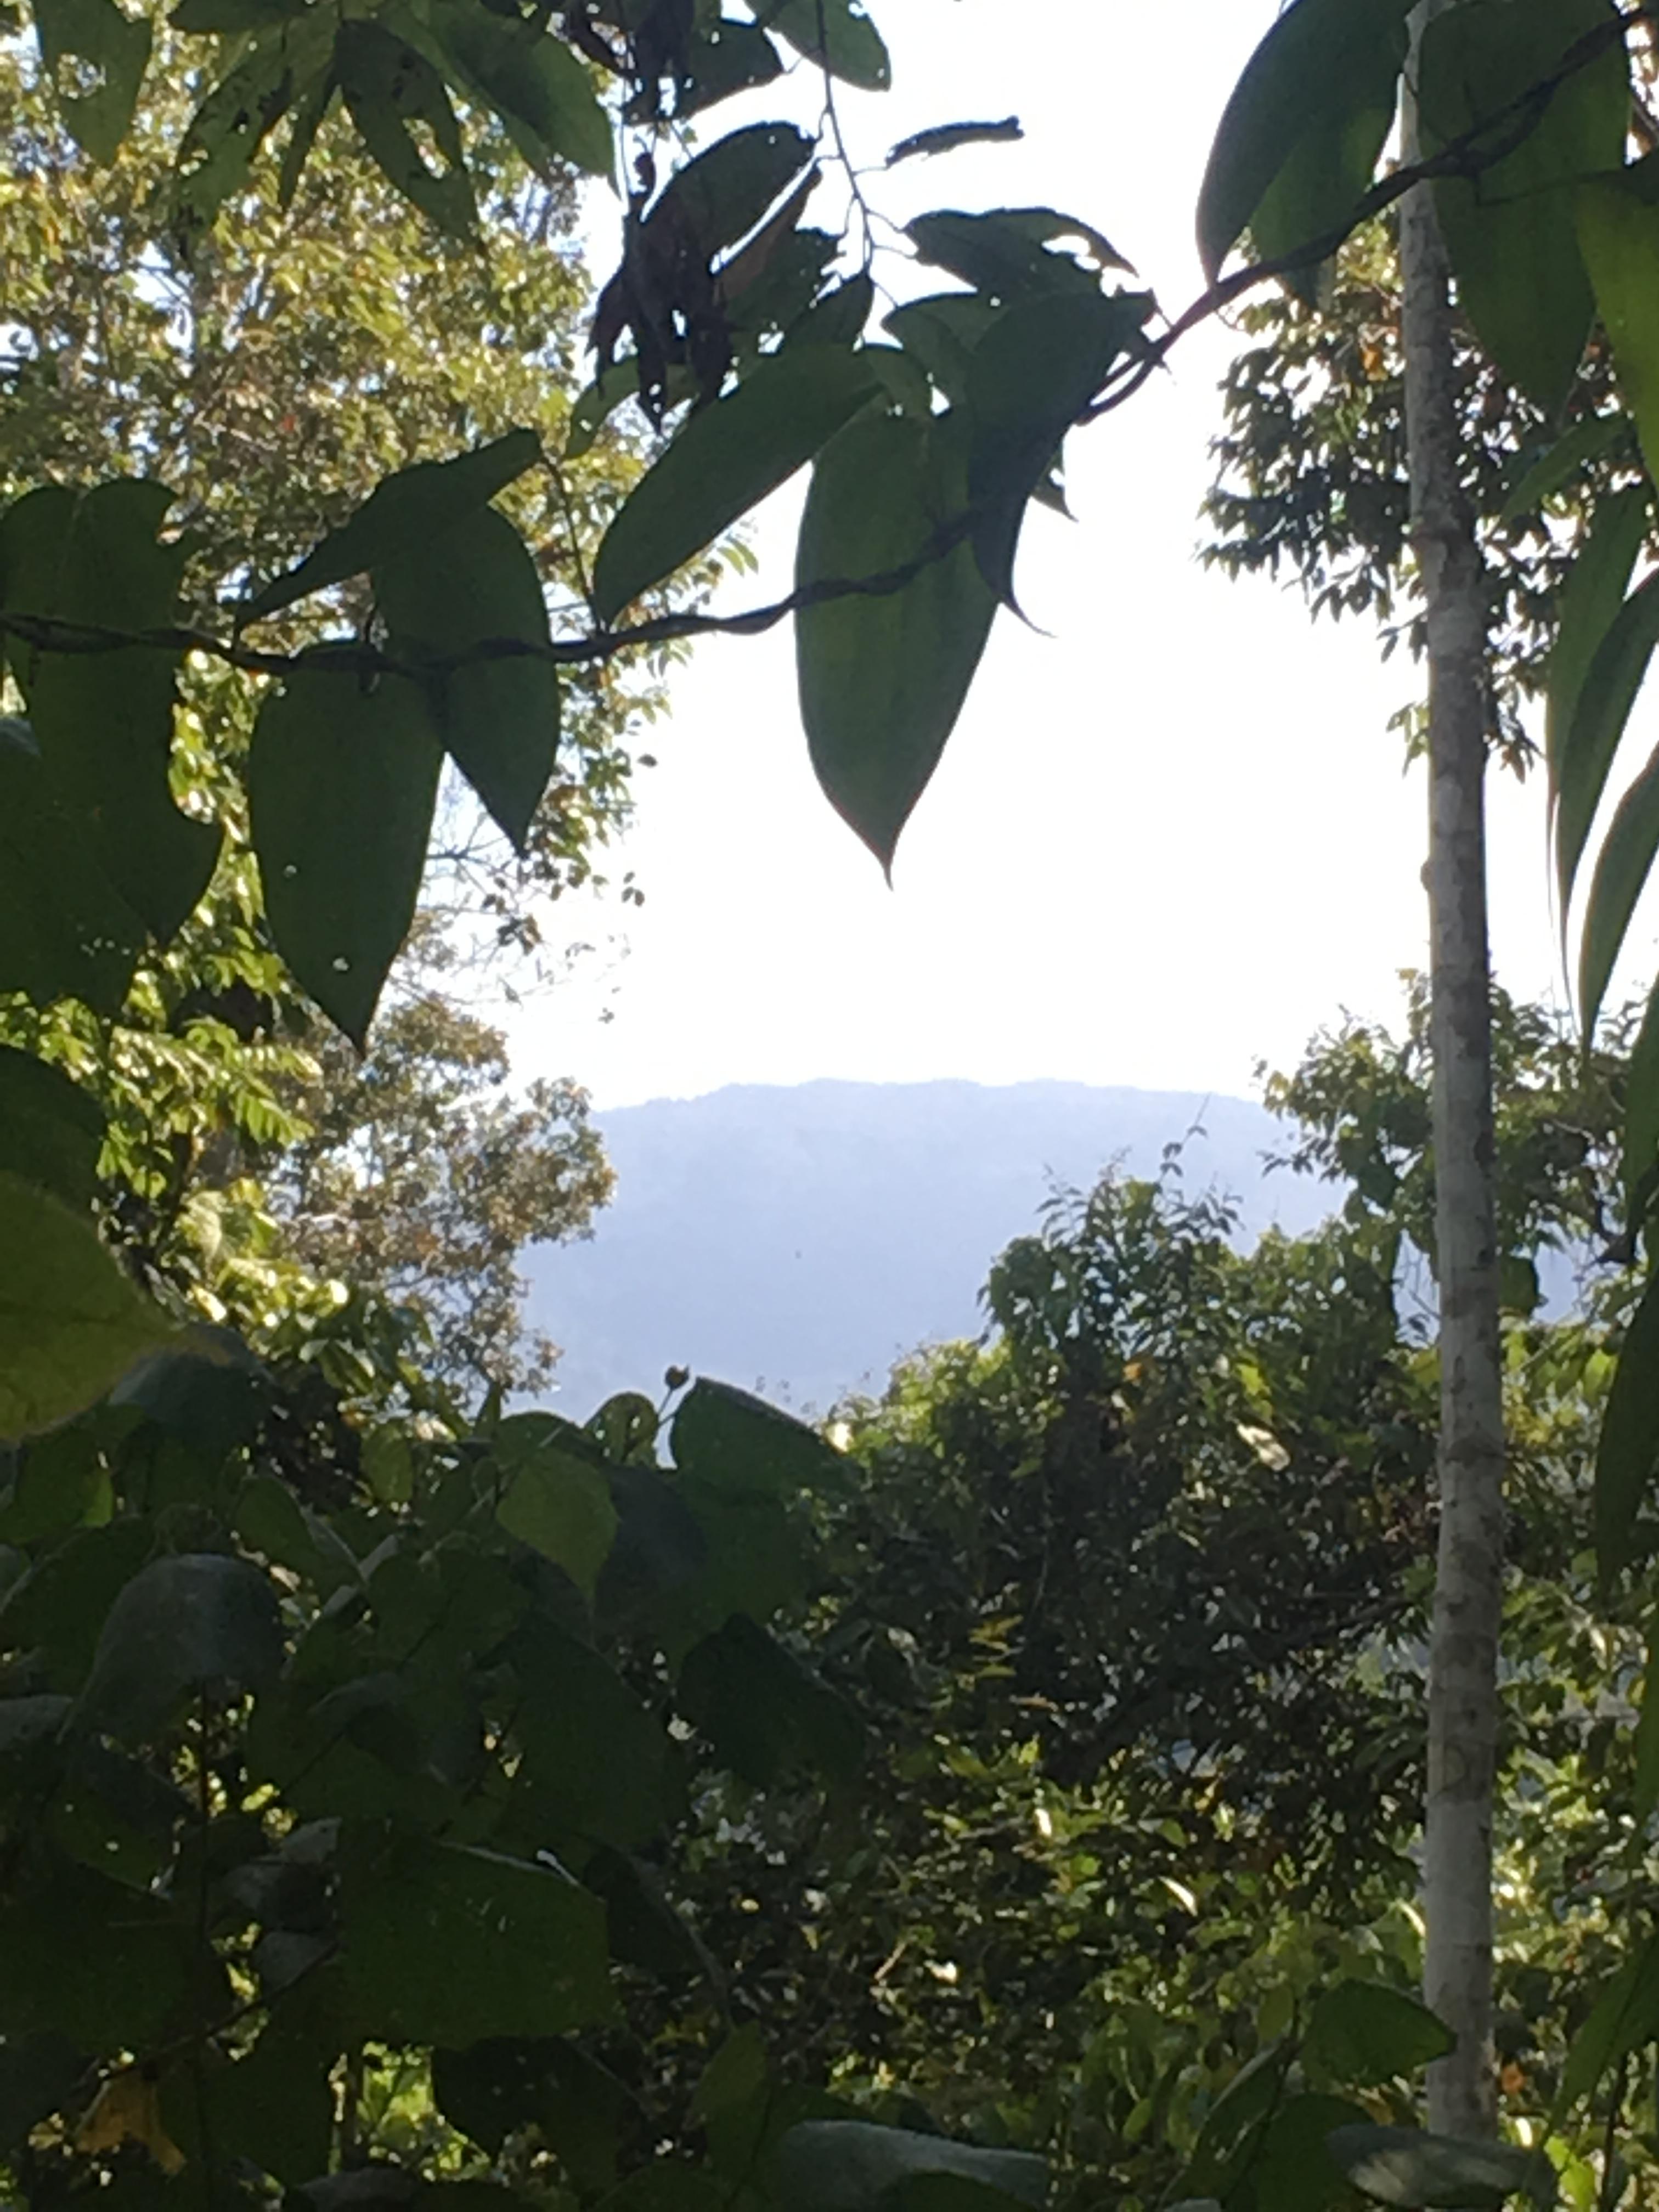 Gunung-Sabatai-the-high-point-on-a-range-Nick-Hughes-September-2019